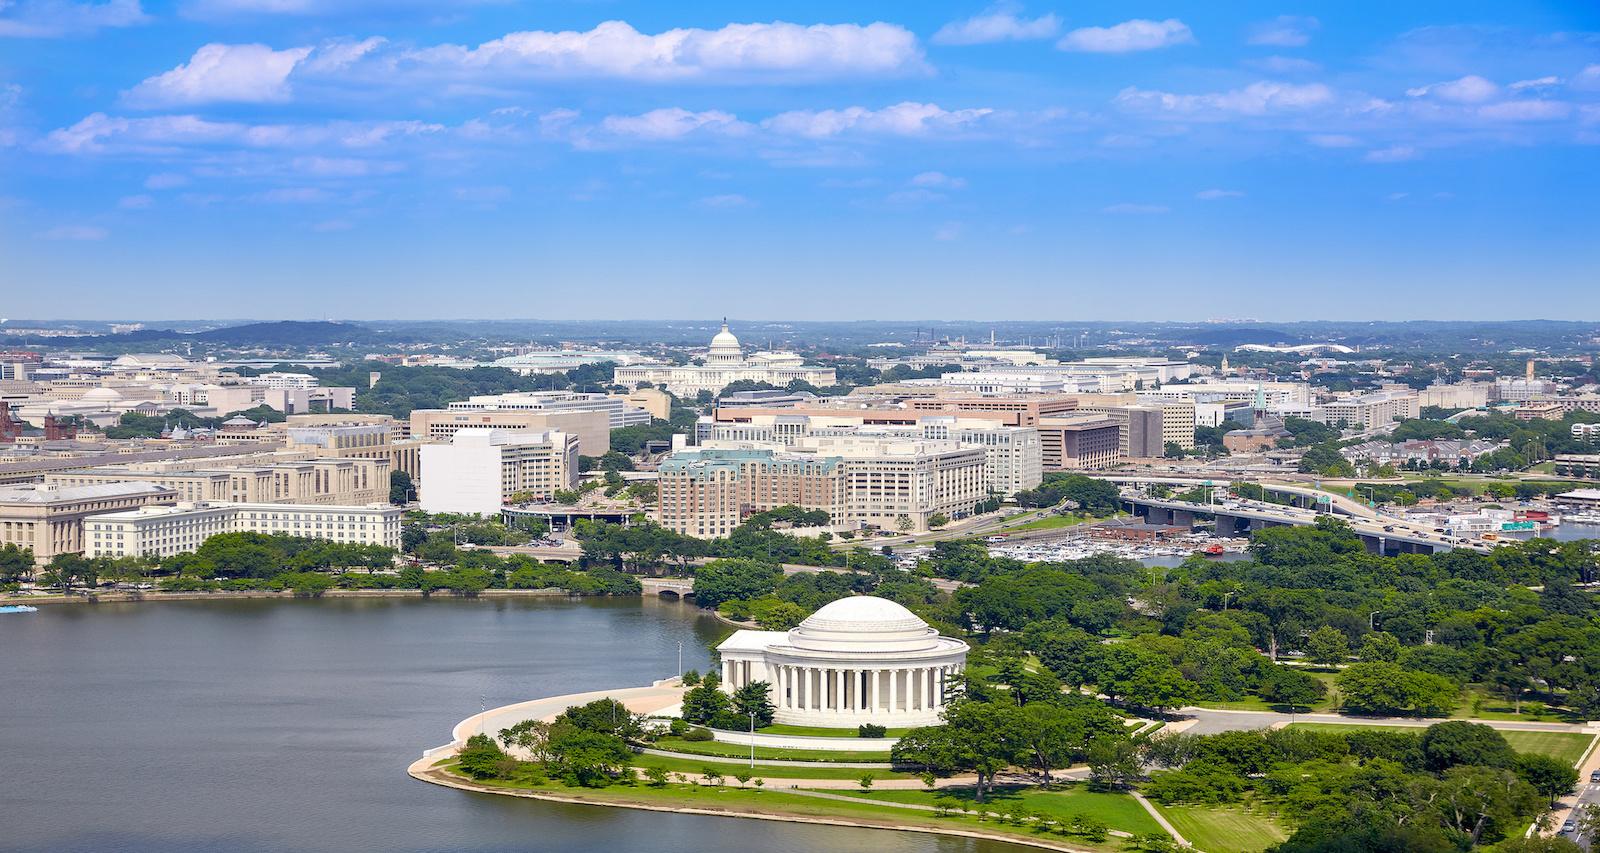 Washington DC aerial view with Thomas Jefferson Memorial building